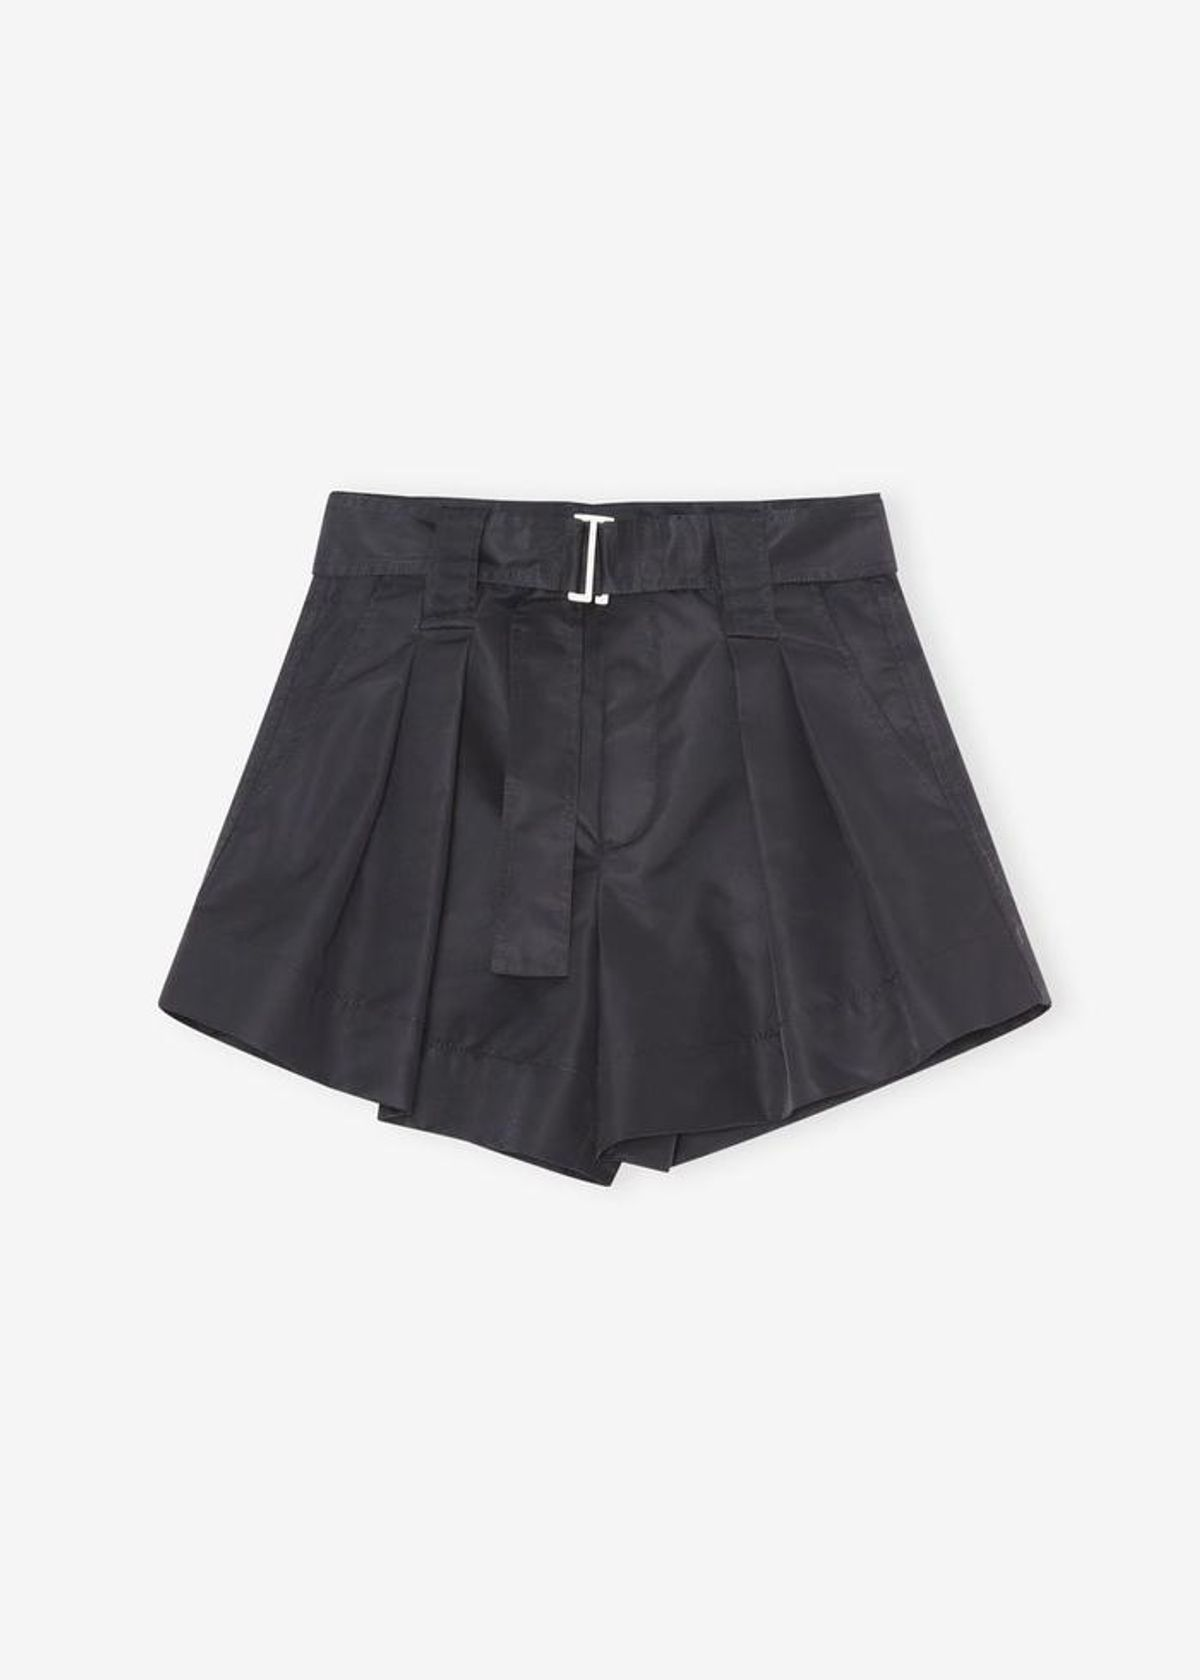 Recycled Nylon Shorts in Black